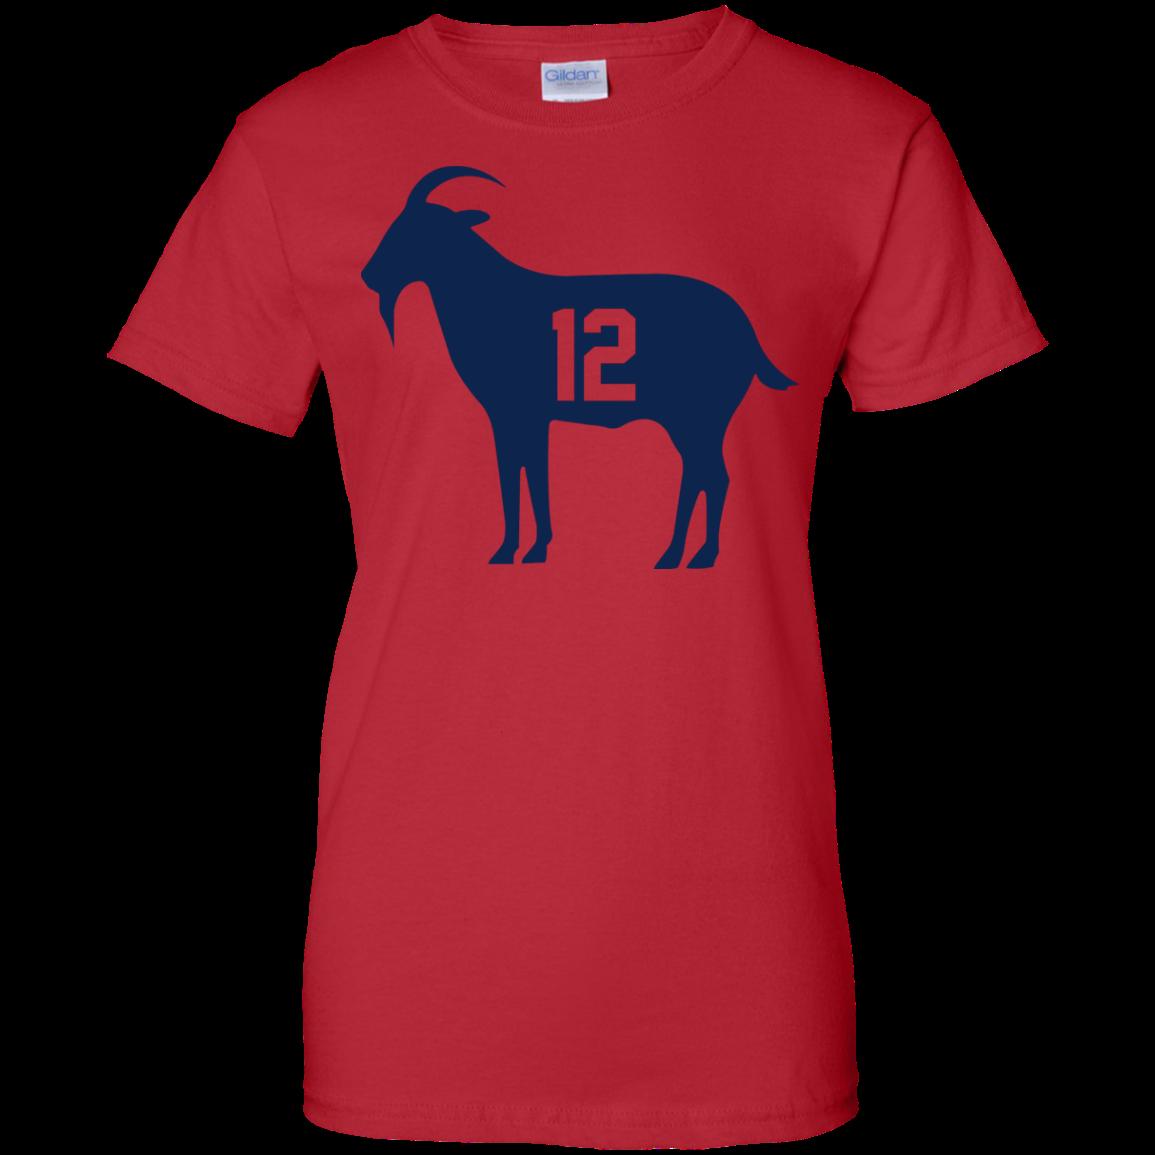 image 83px Goat Tb 12 Tom Brady T Shirt, Hoodies, Tank Top